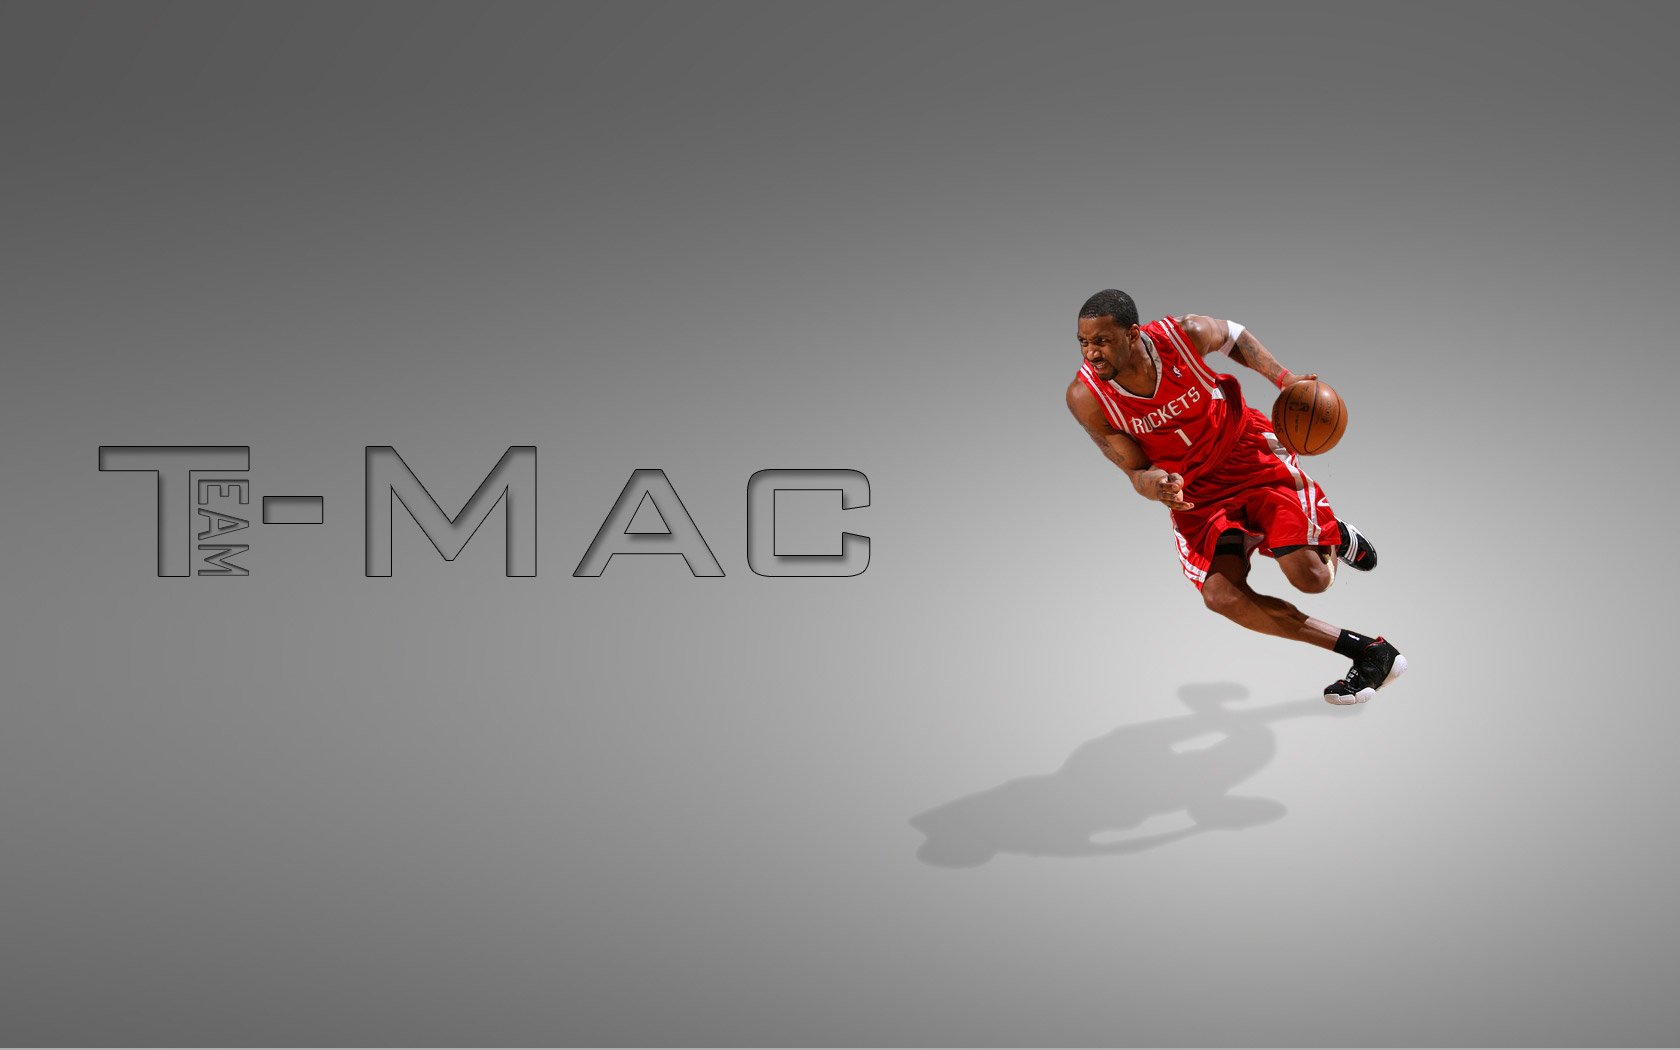 T Mac Widescreen Wallpaper Basketball Wallpapers at 1680x1050